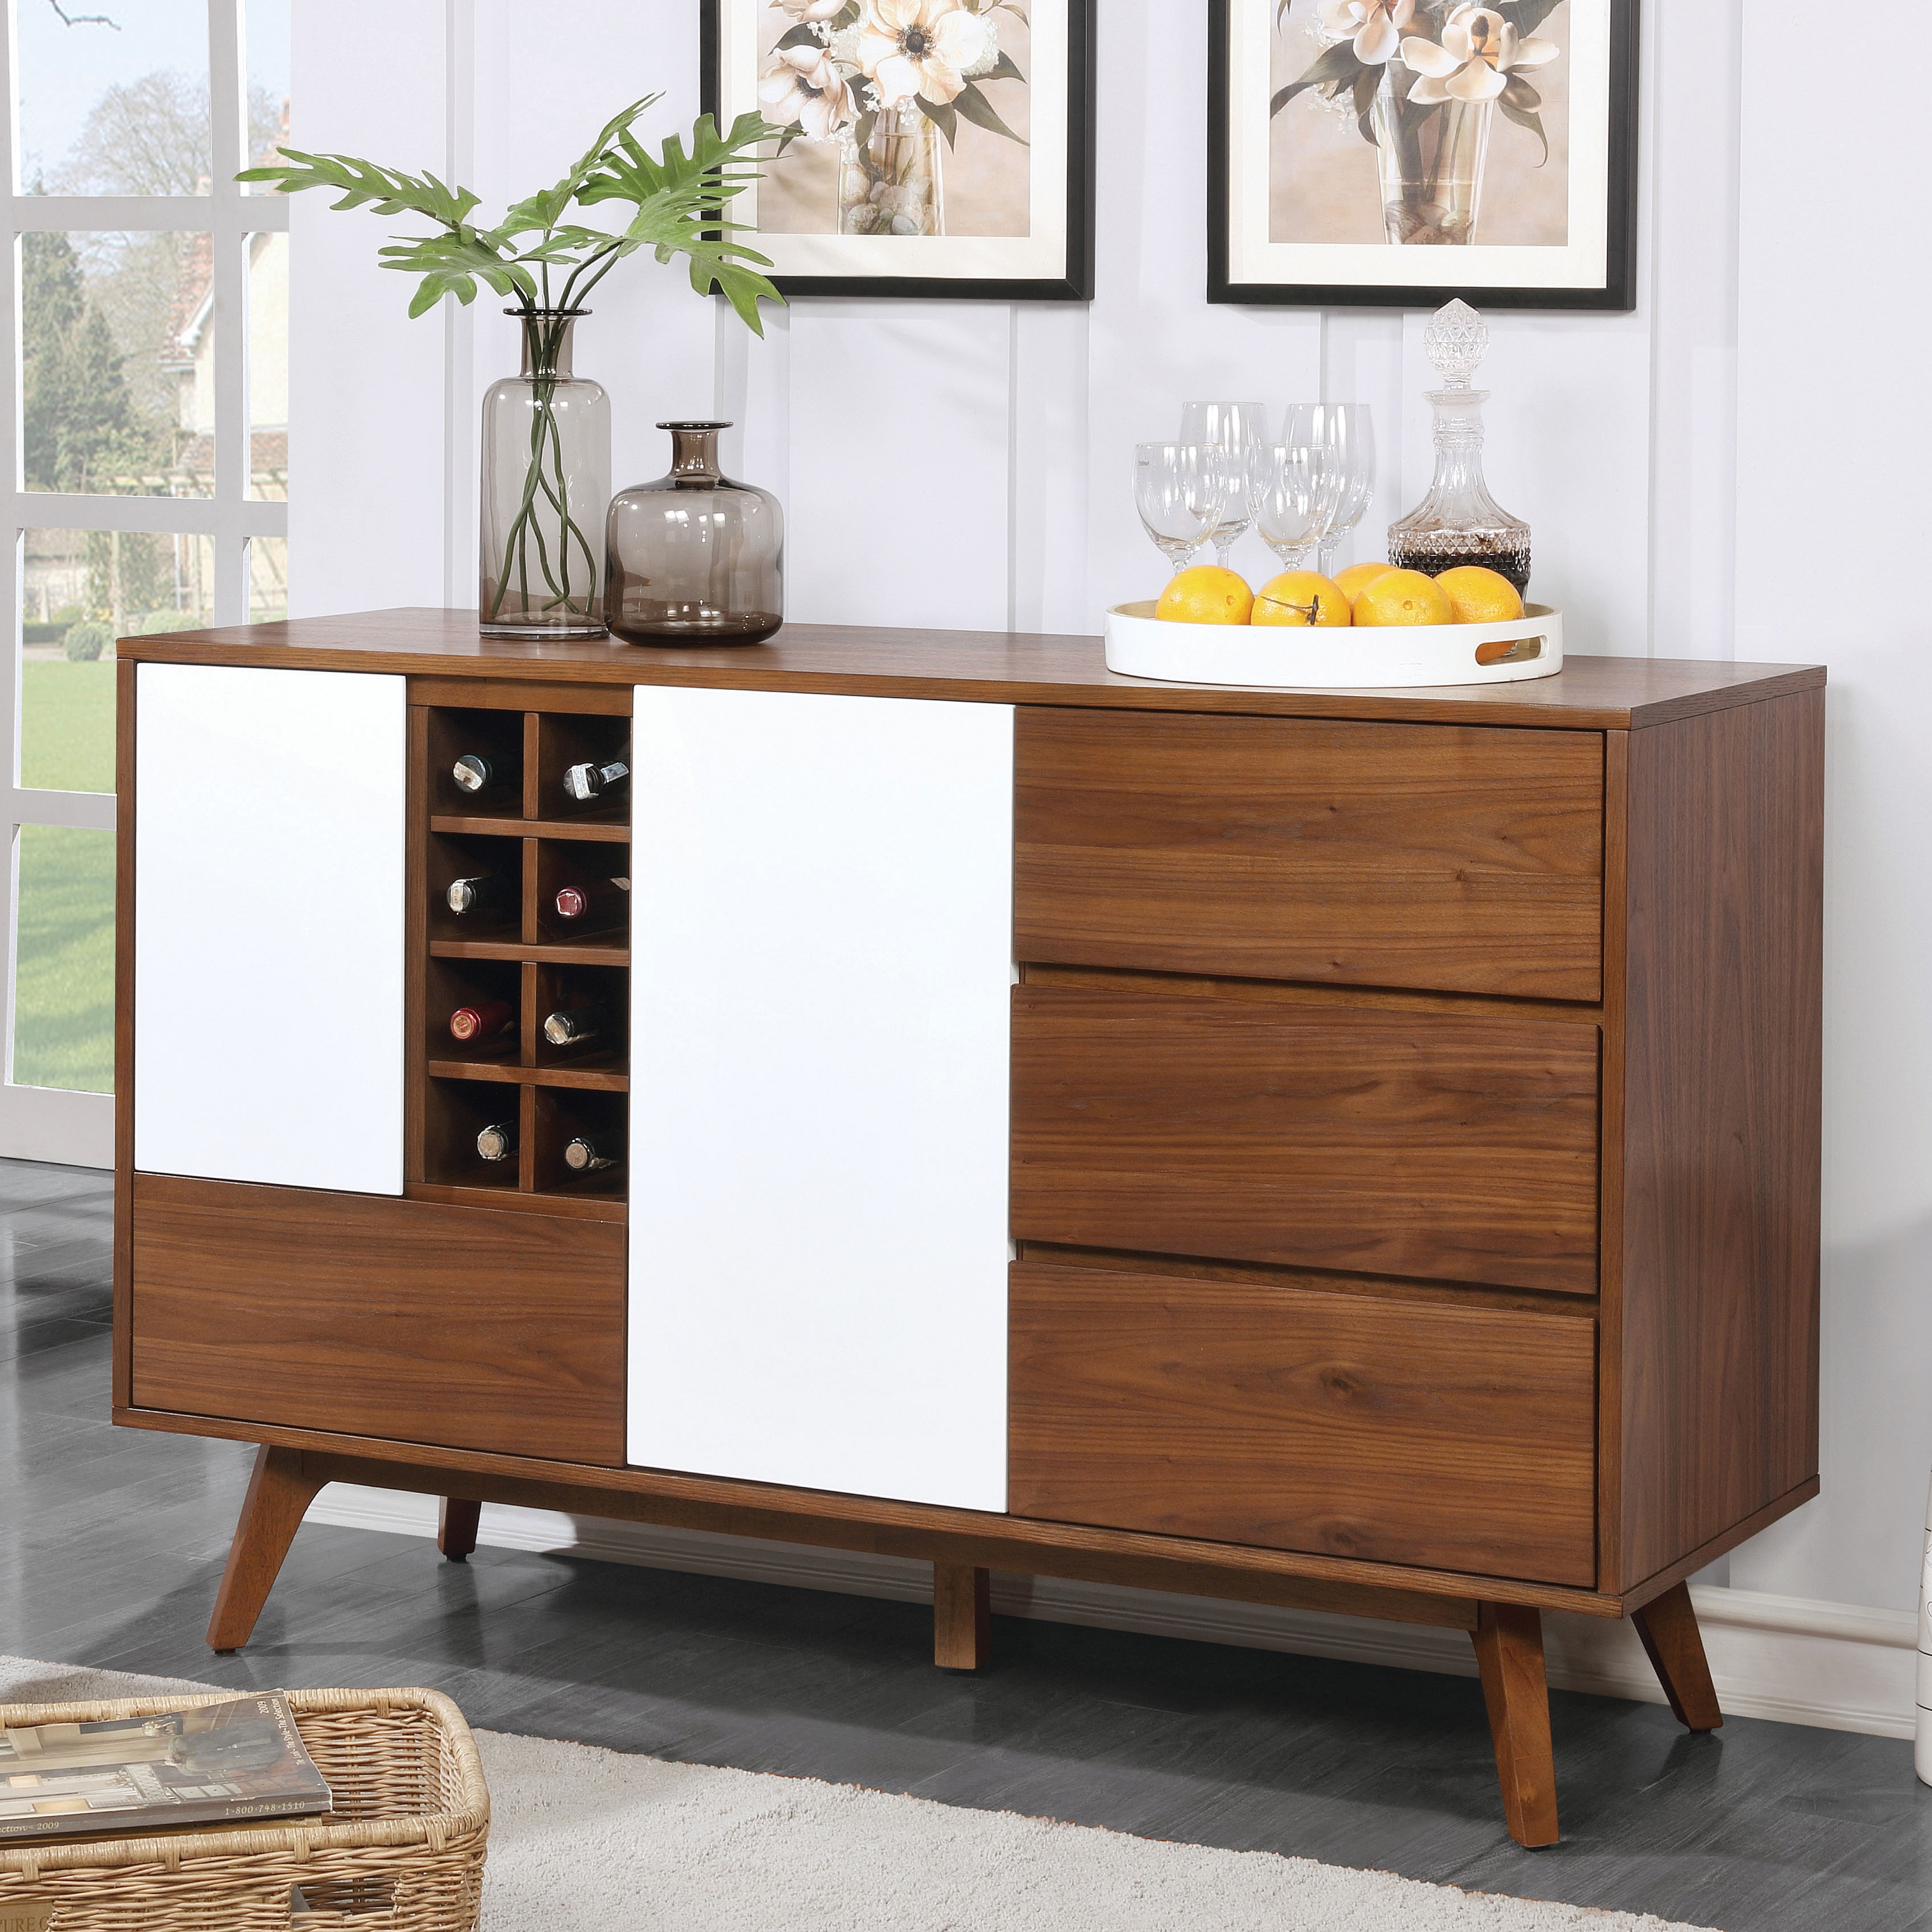 Furniture of america liman mid century modern 2 tone oak white multi storage buffet wine cabinet